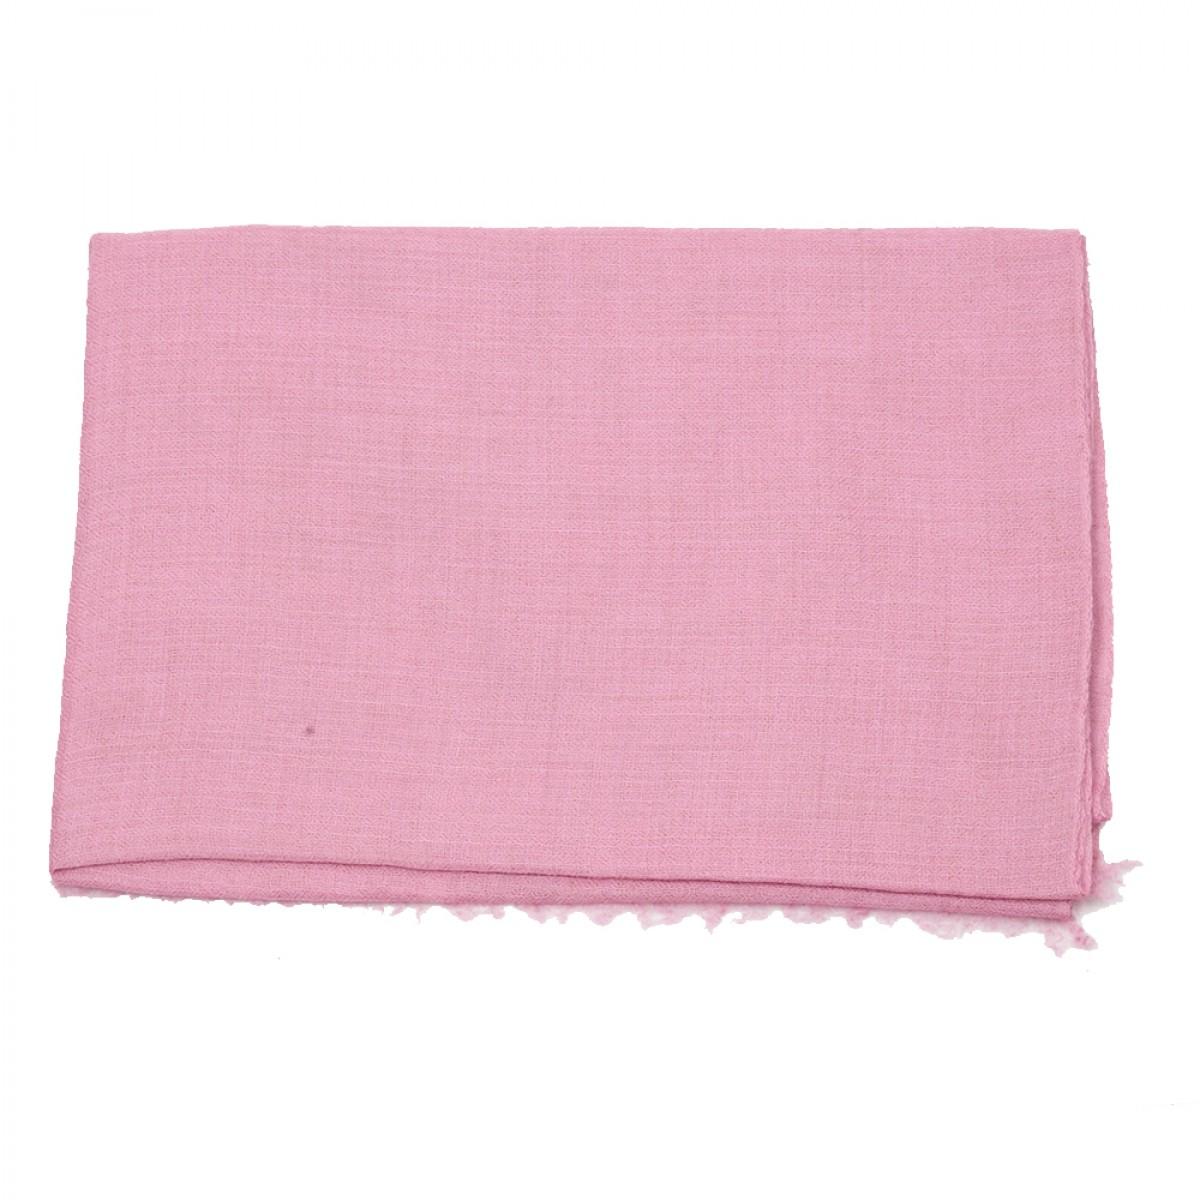 Plain Pashmina Stole - Pink Lemonade